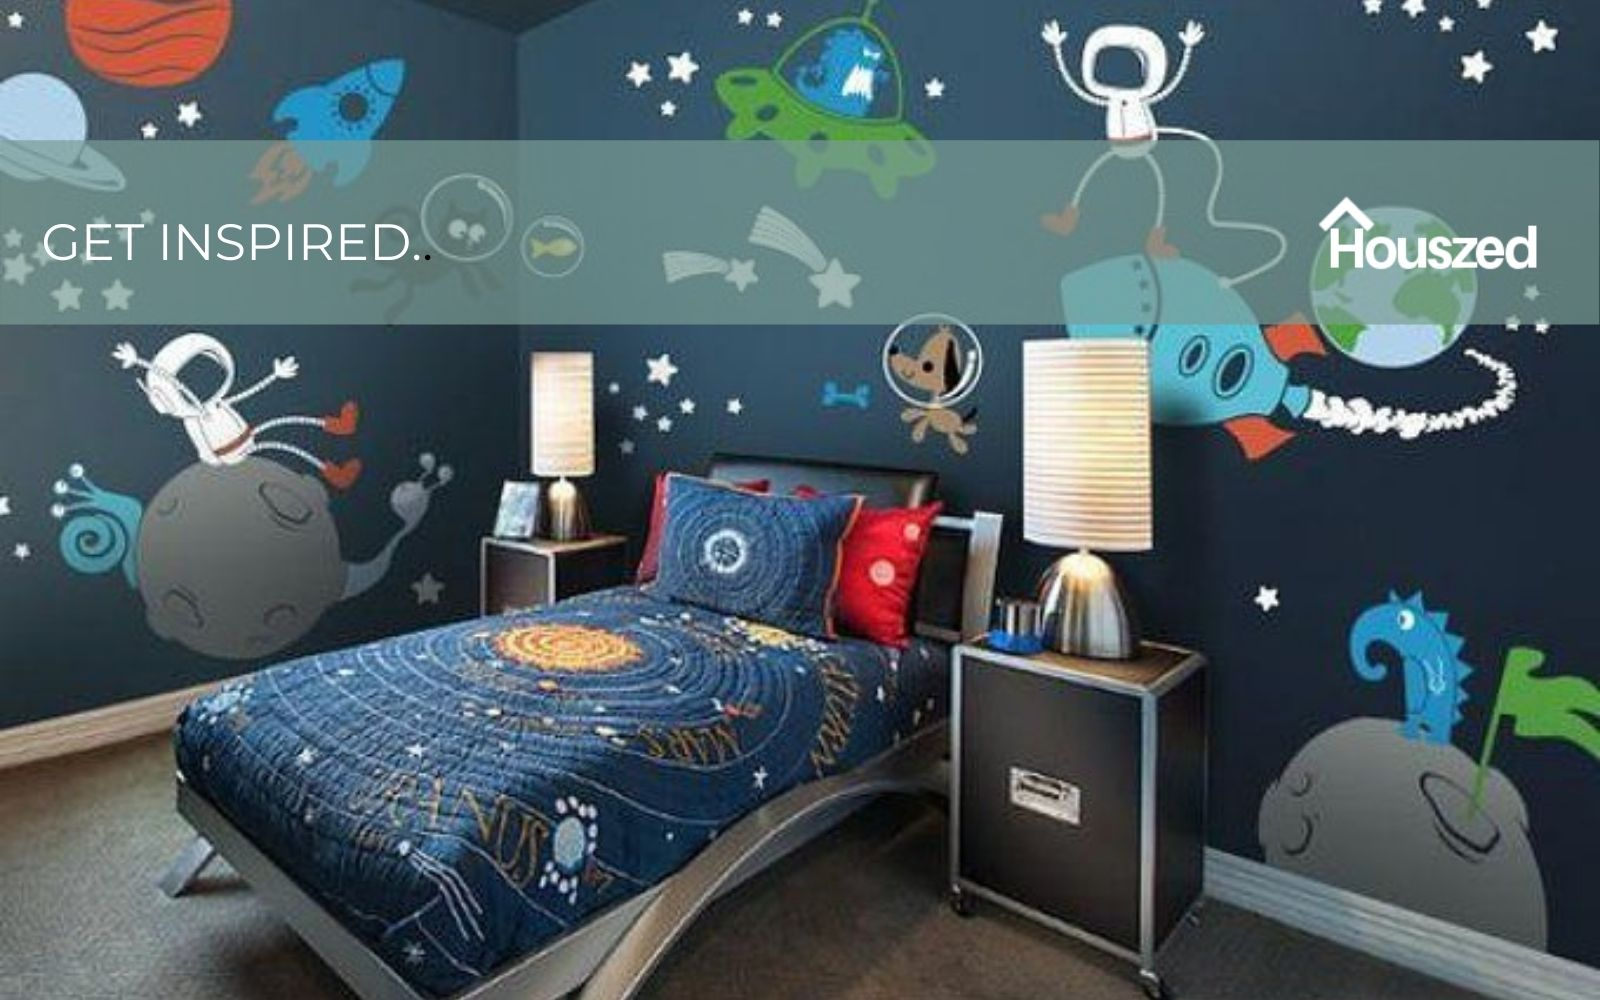 19 Space Bedroom Ideas Ready For Lift Off In 2021 Kids Houszed